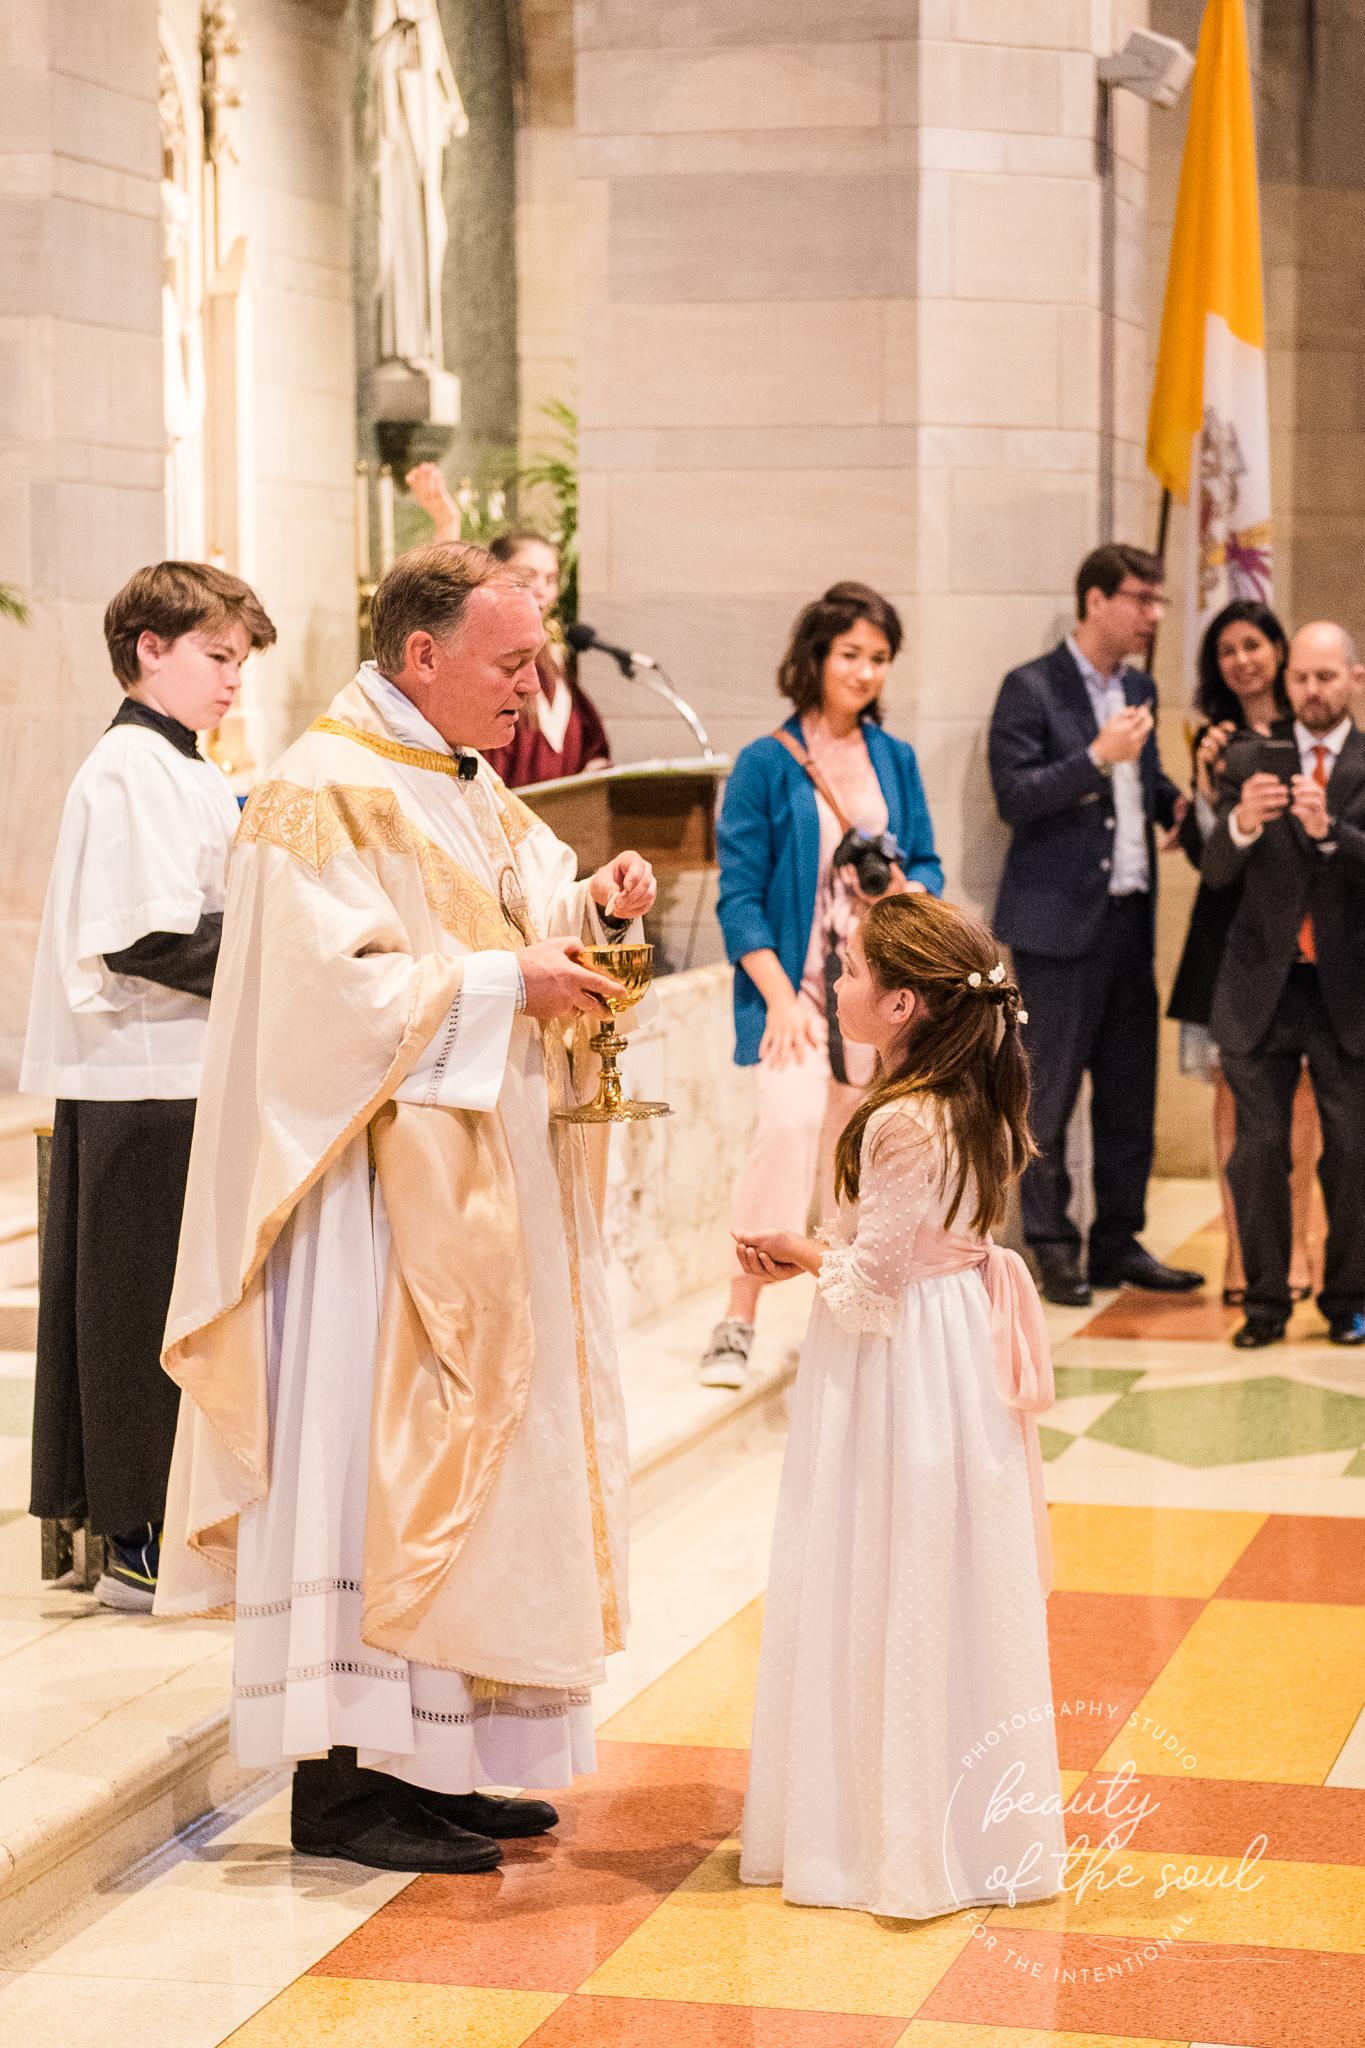 washington-dc-st-ann-catholic-church-first-holy-communion-beauty-of-the-soul-studio-may-2019-20.jpg